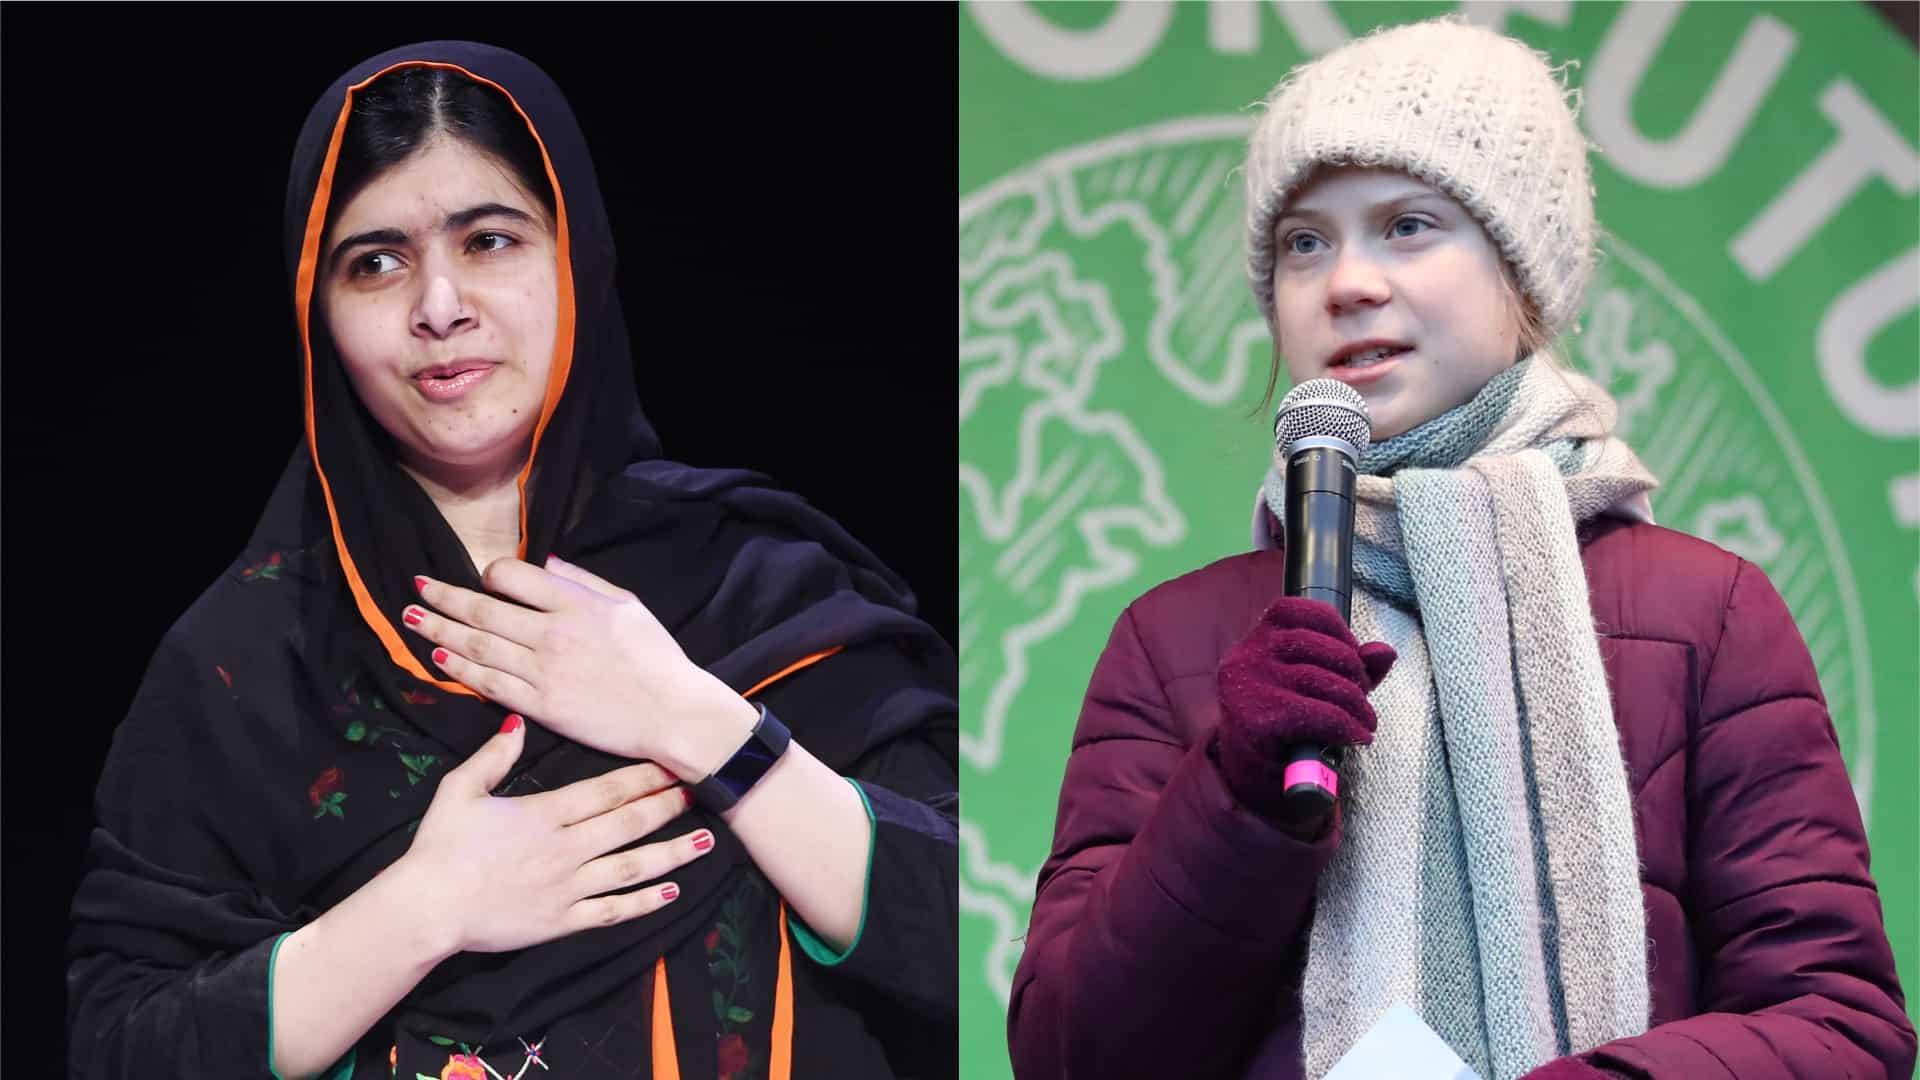 Greta Thunberg meets Malala Yousafzai for the first time